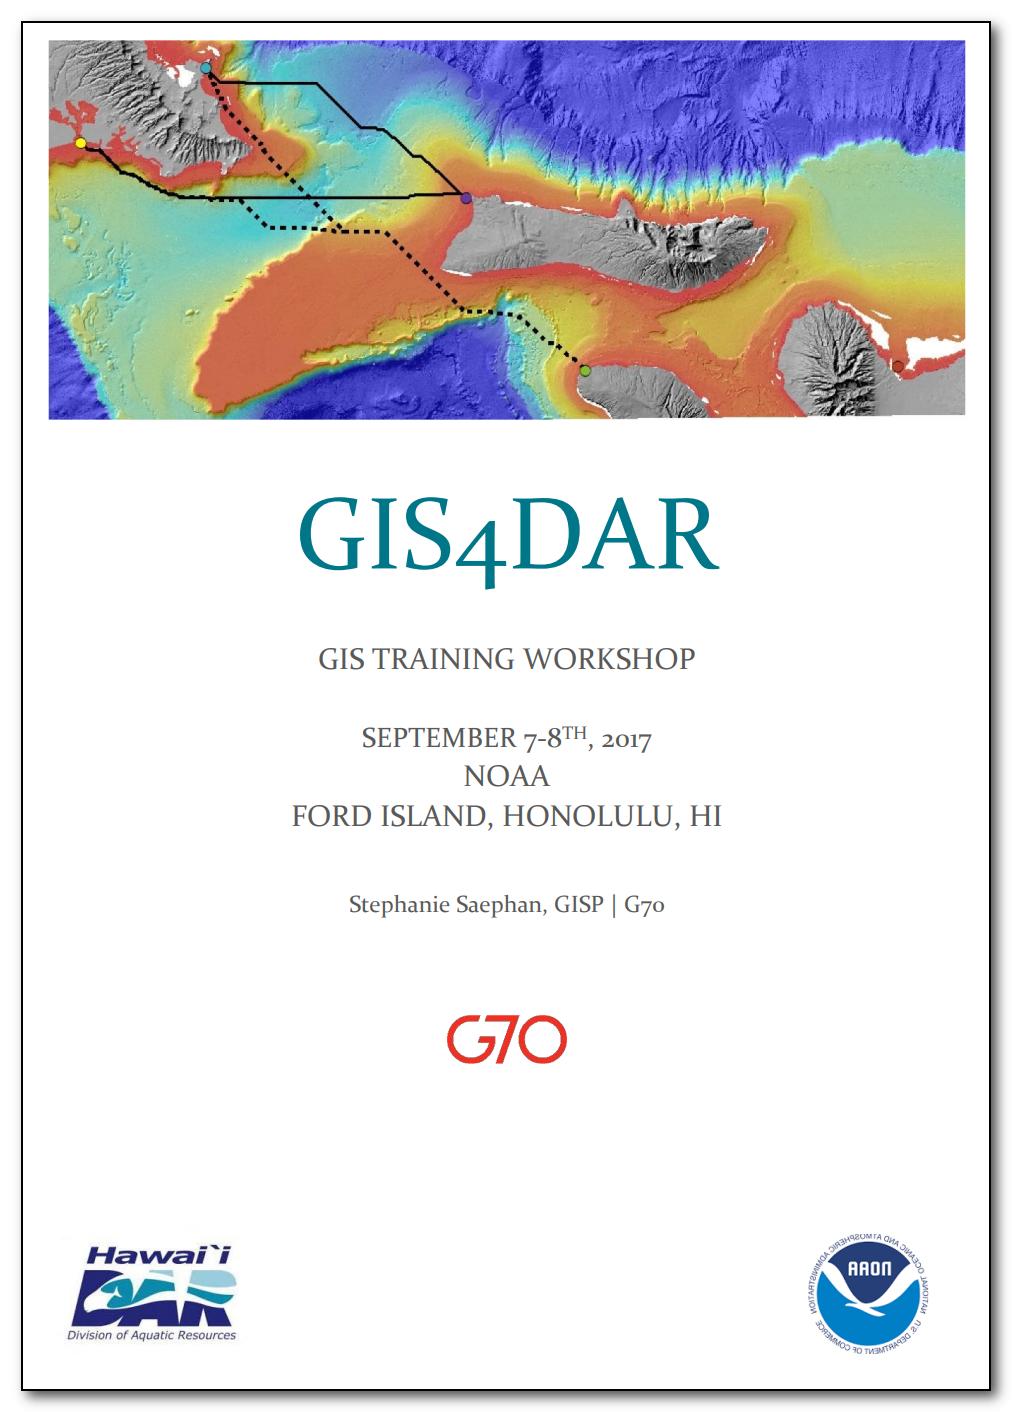 GIS4DAR ArcGIS Training Workshop - September 7-8, 2017